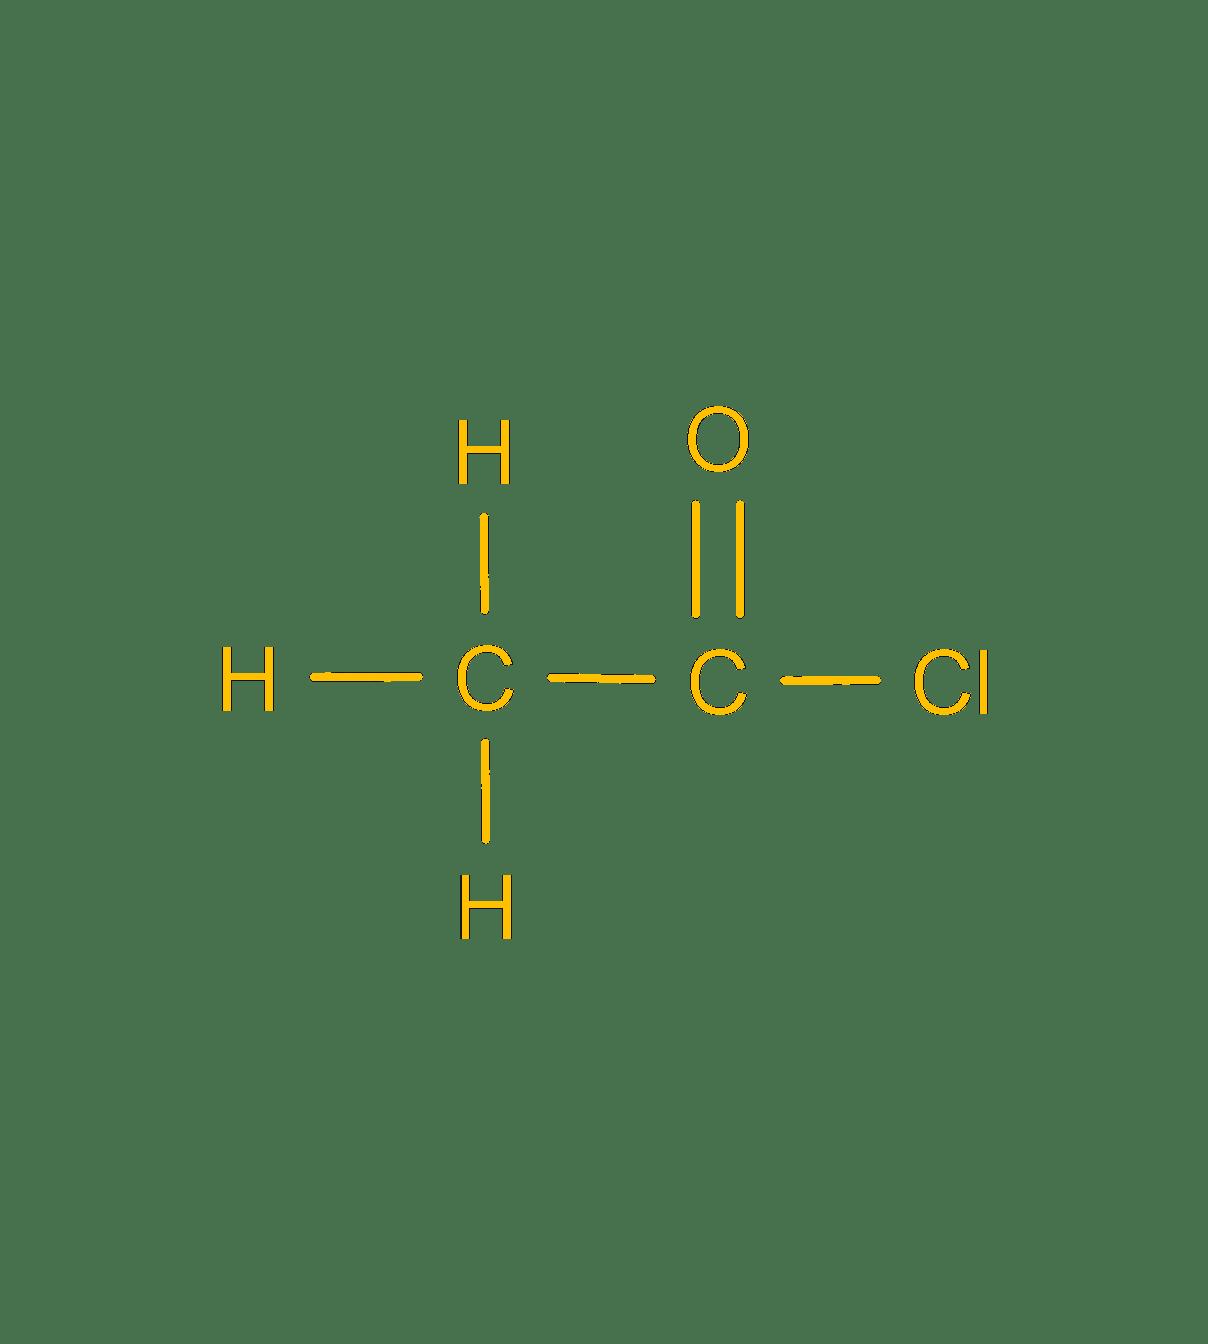 ethanoyl chloride